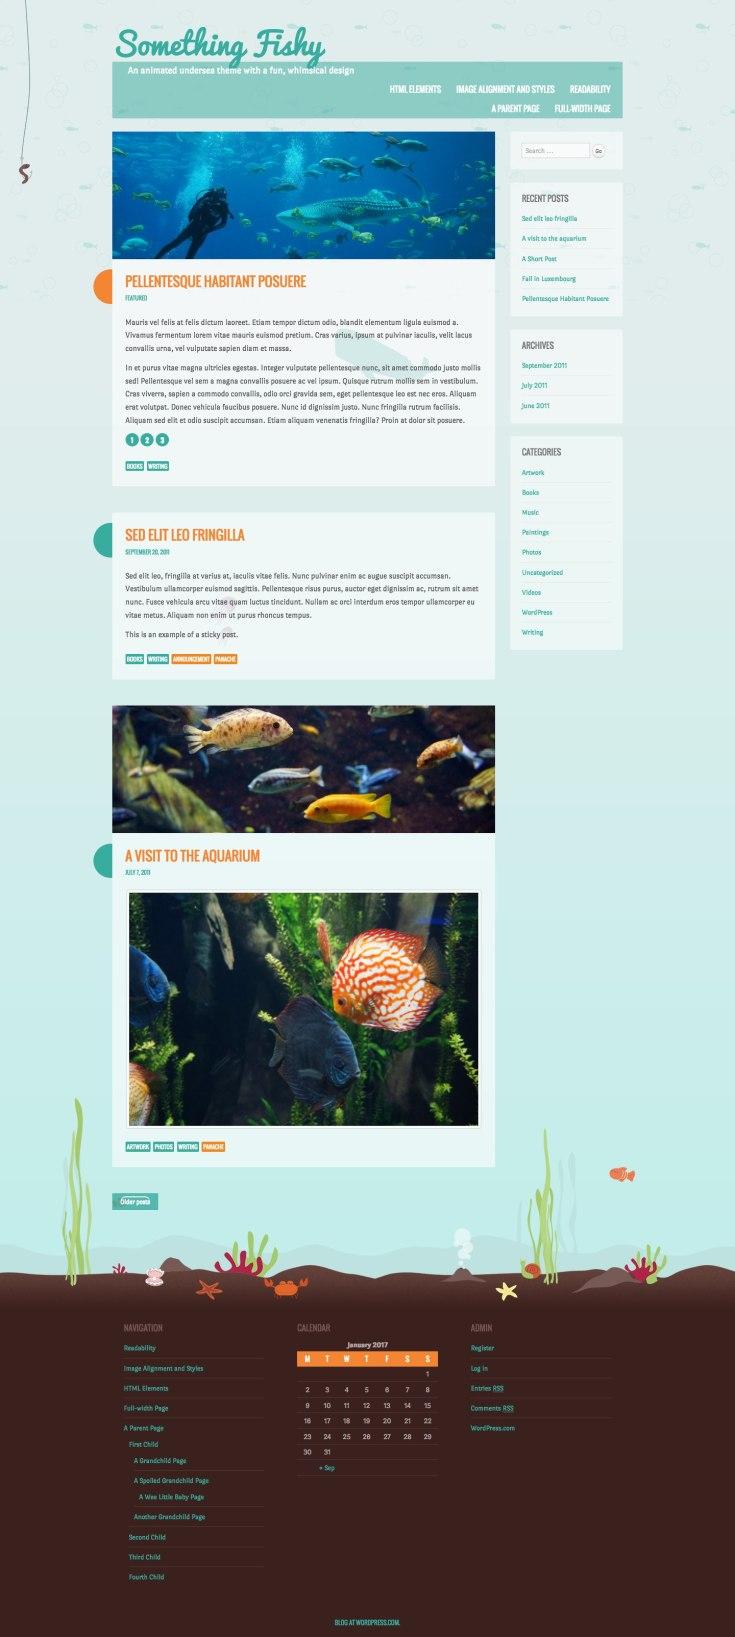 Screenshot of the Something Fishy theme